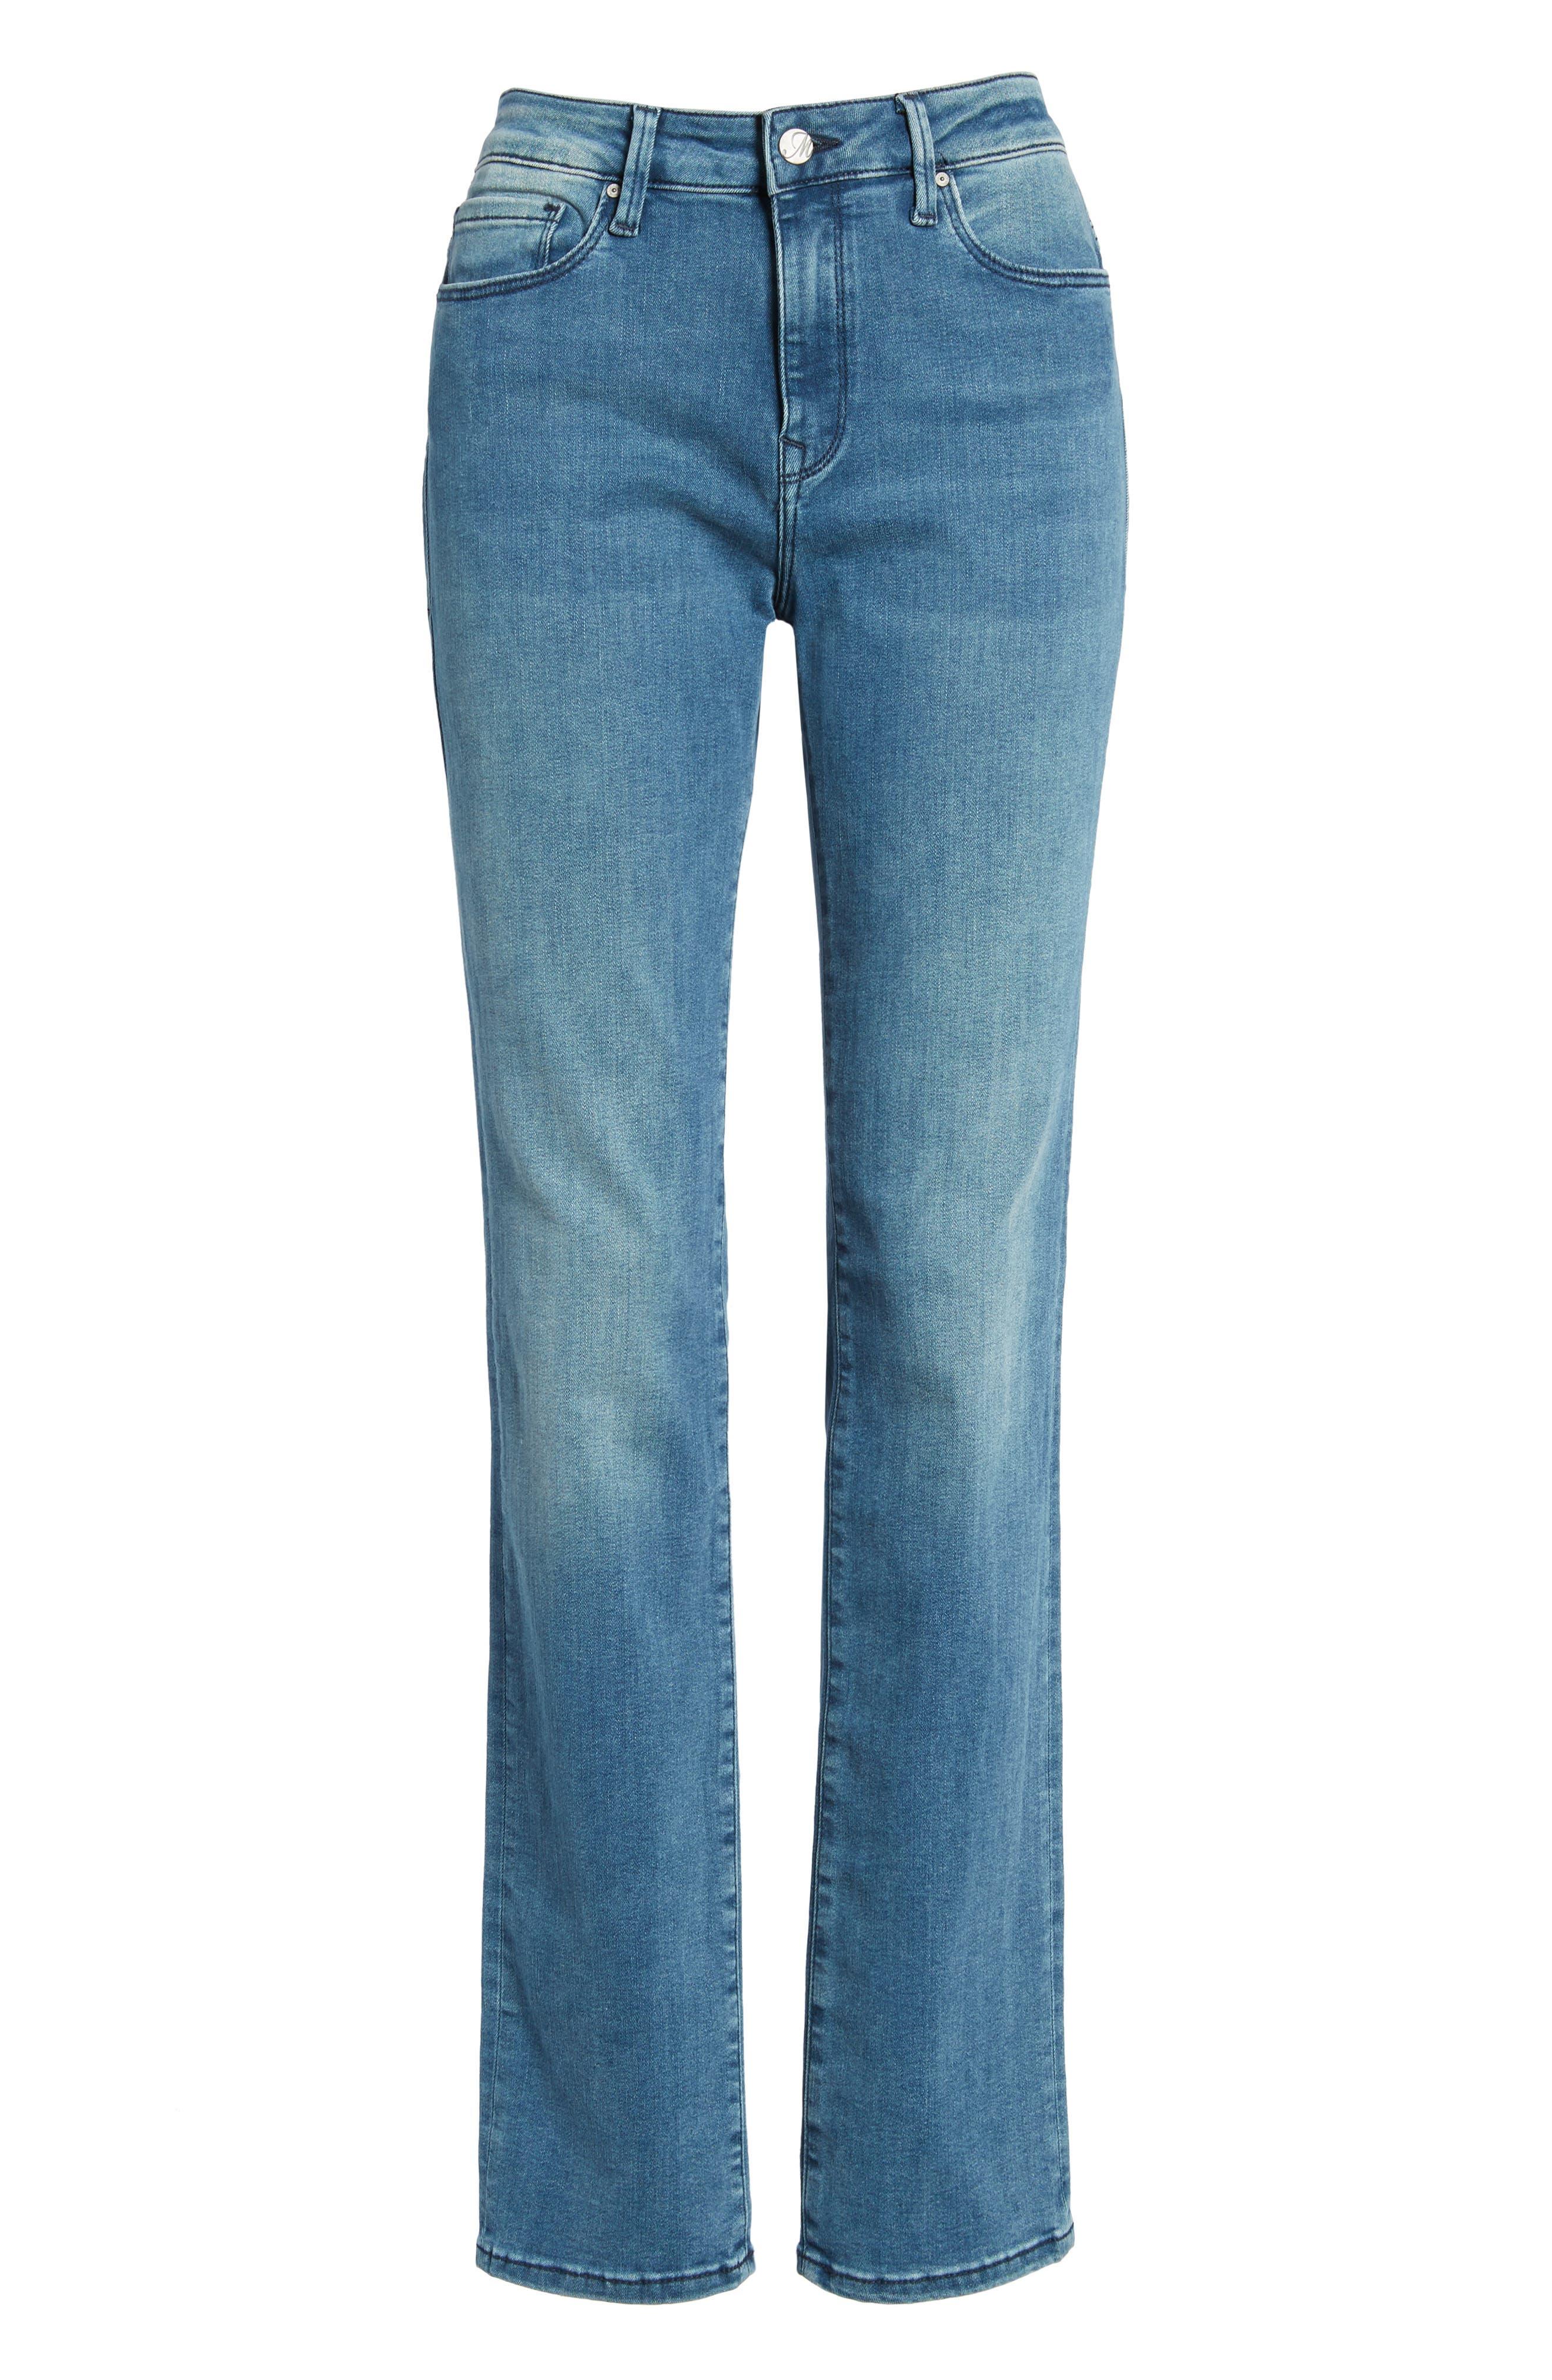 Kendra High Waist Straight Leg Jeans,                             Alternate thumbnail 6, color,                             420